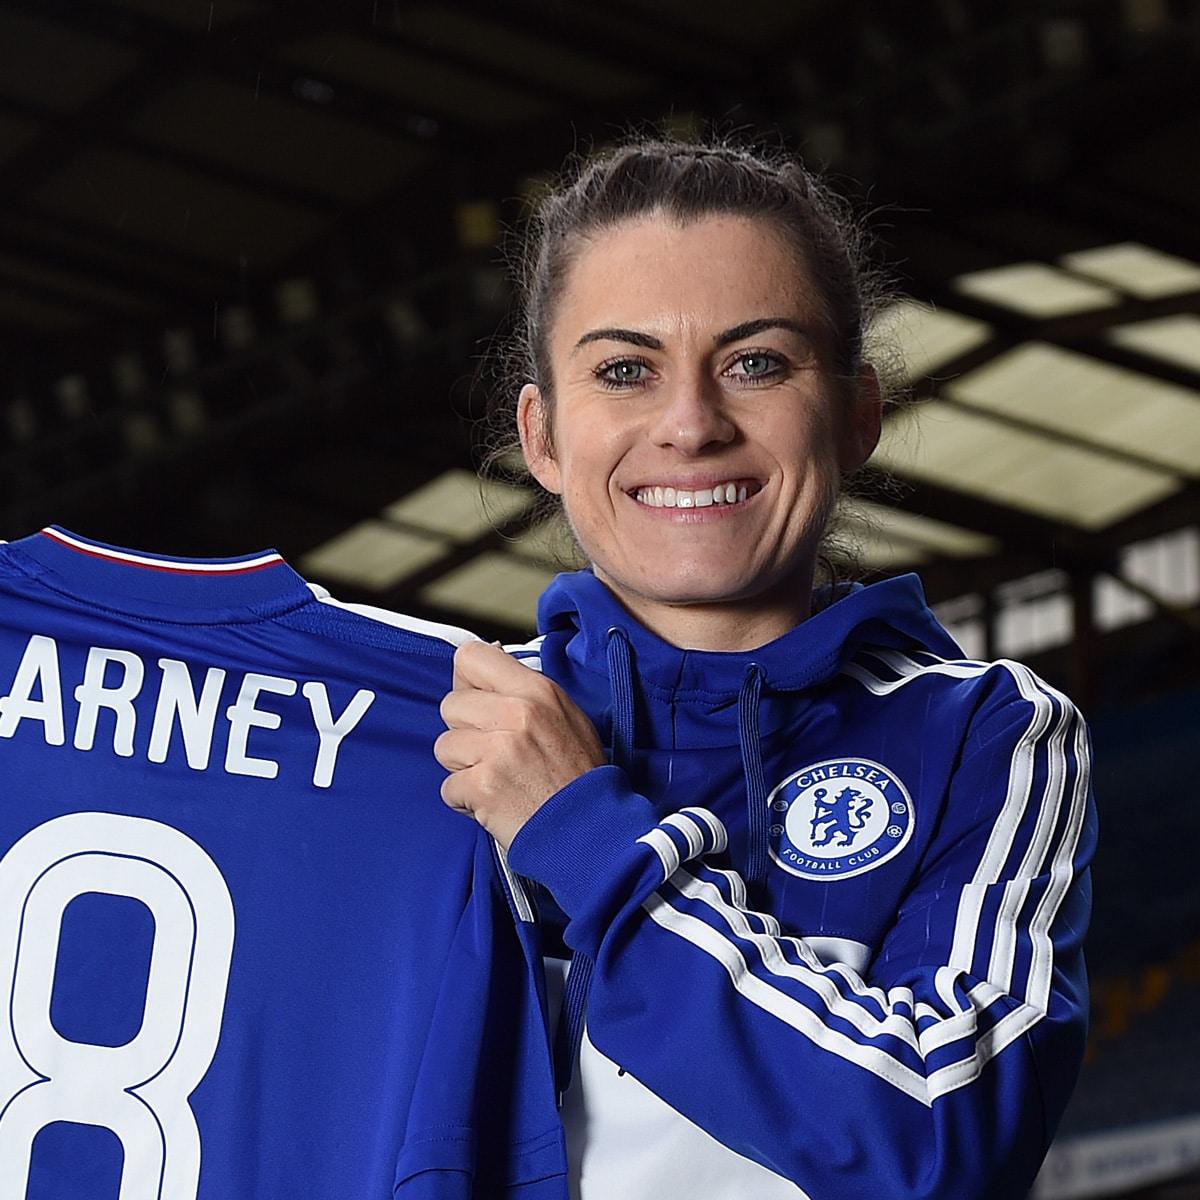 Karen-Carney-MBE-Female-womens-Chelsea-English-football-soccer-star-at-Great-British-Speakers